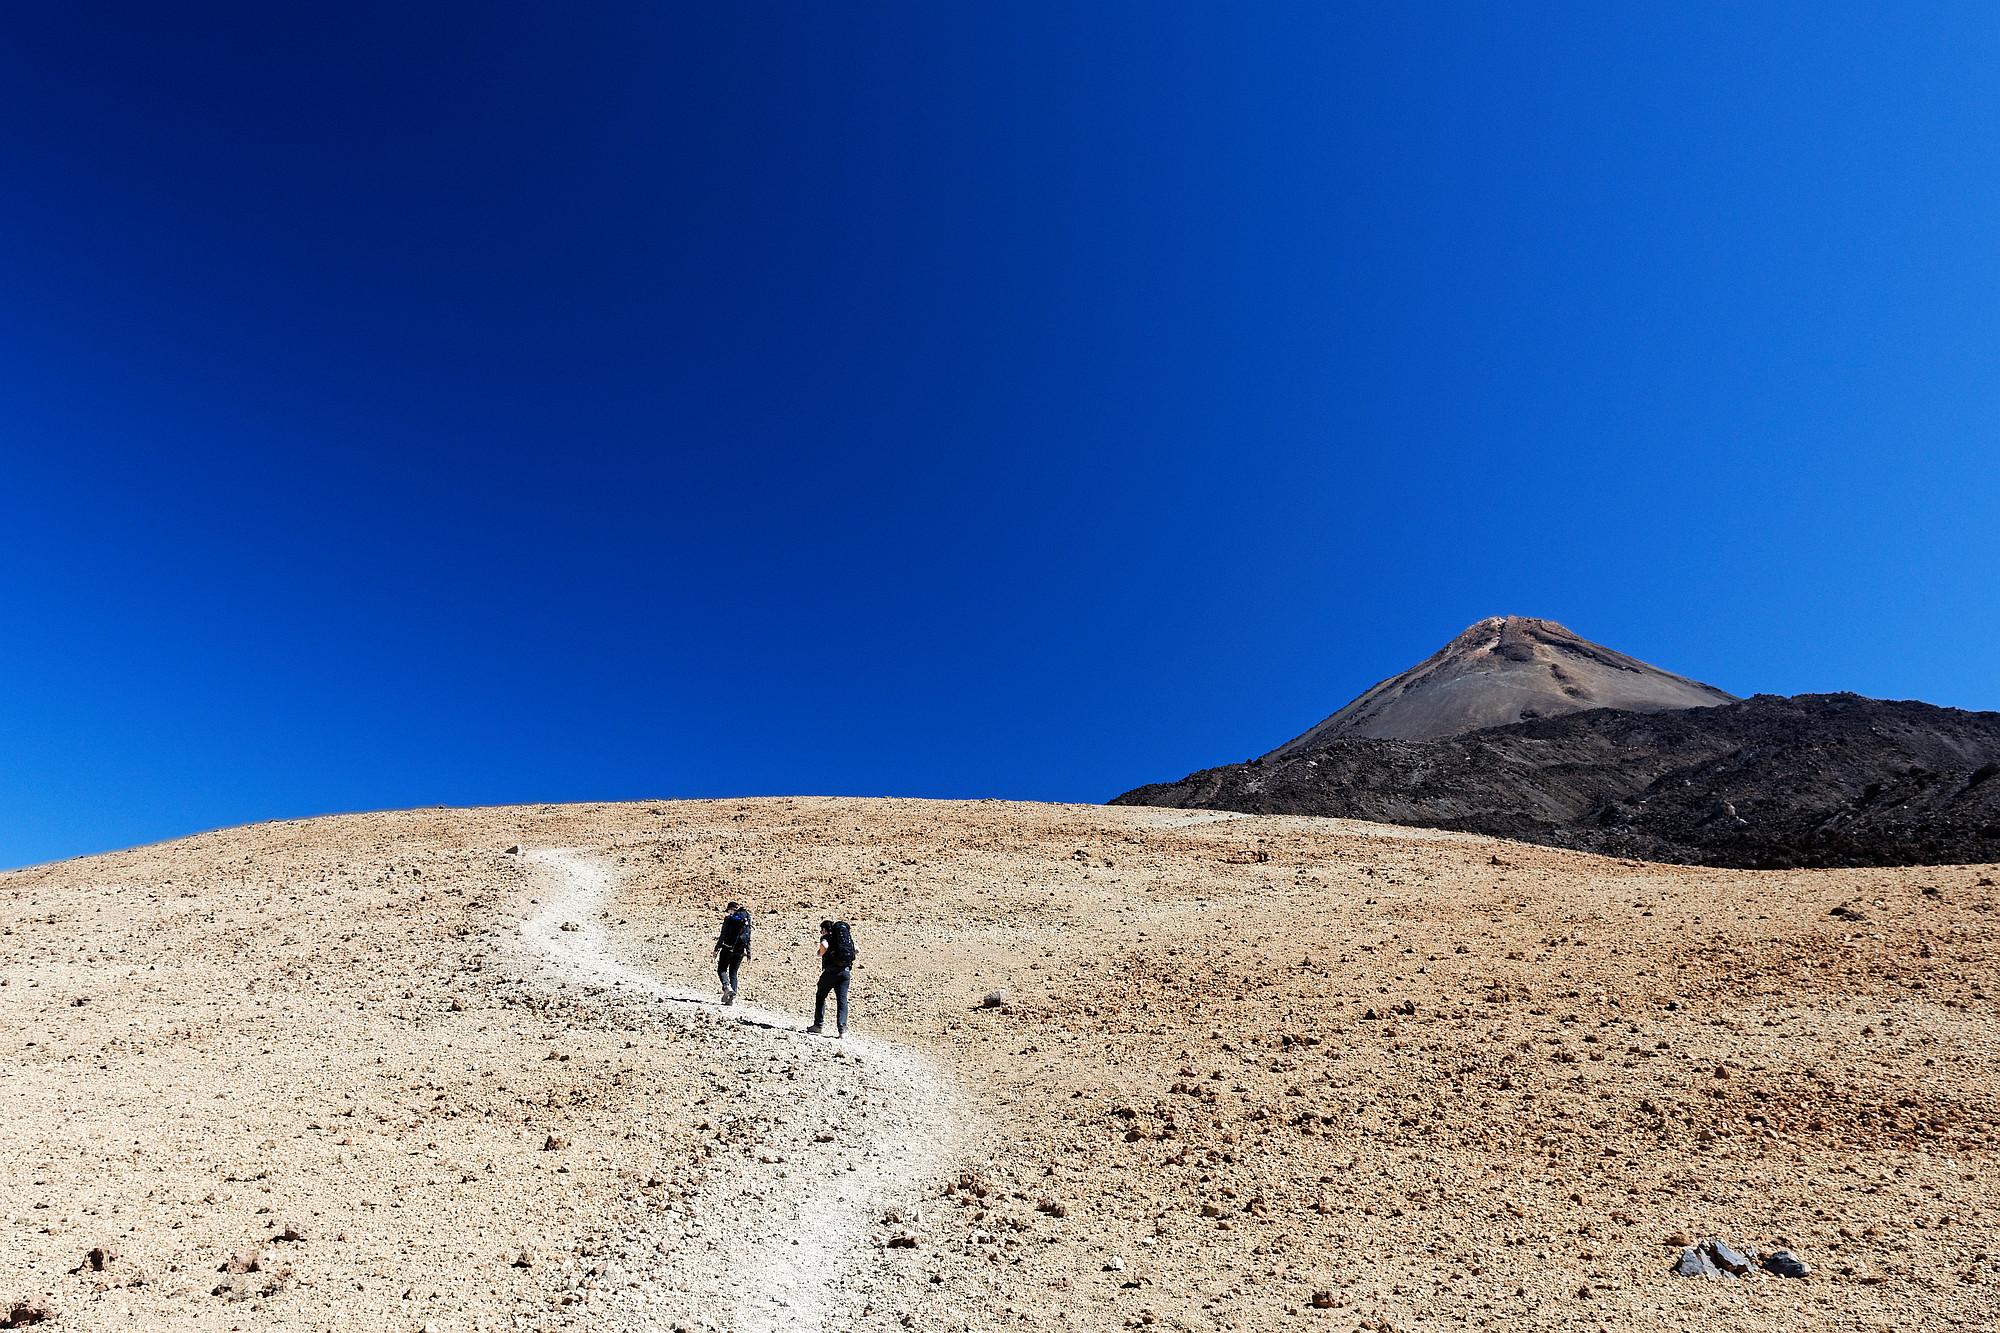 aufstieg pico del teide-2021-03-04